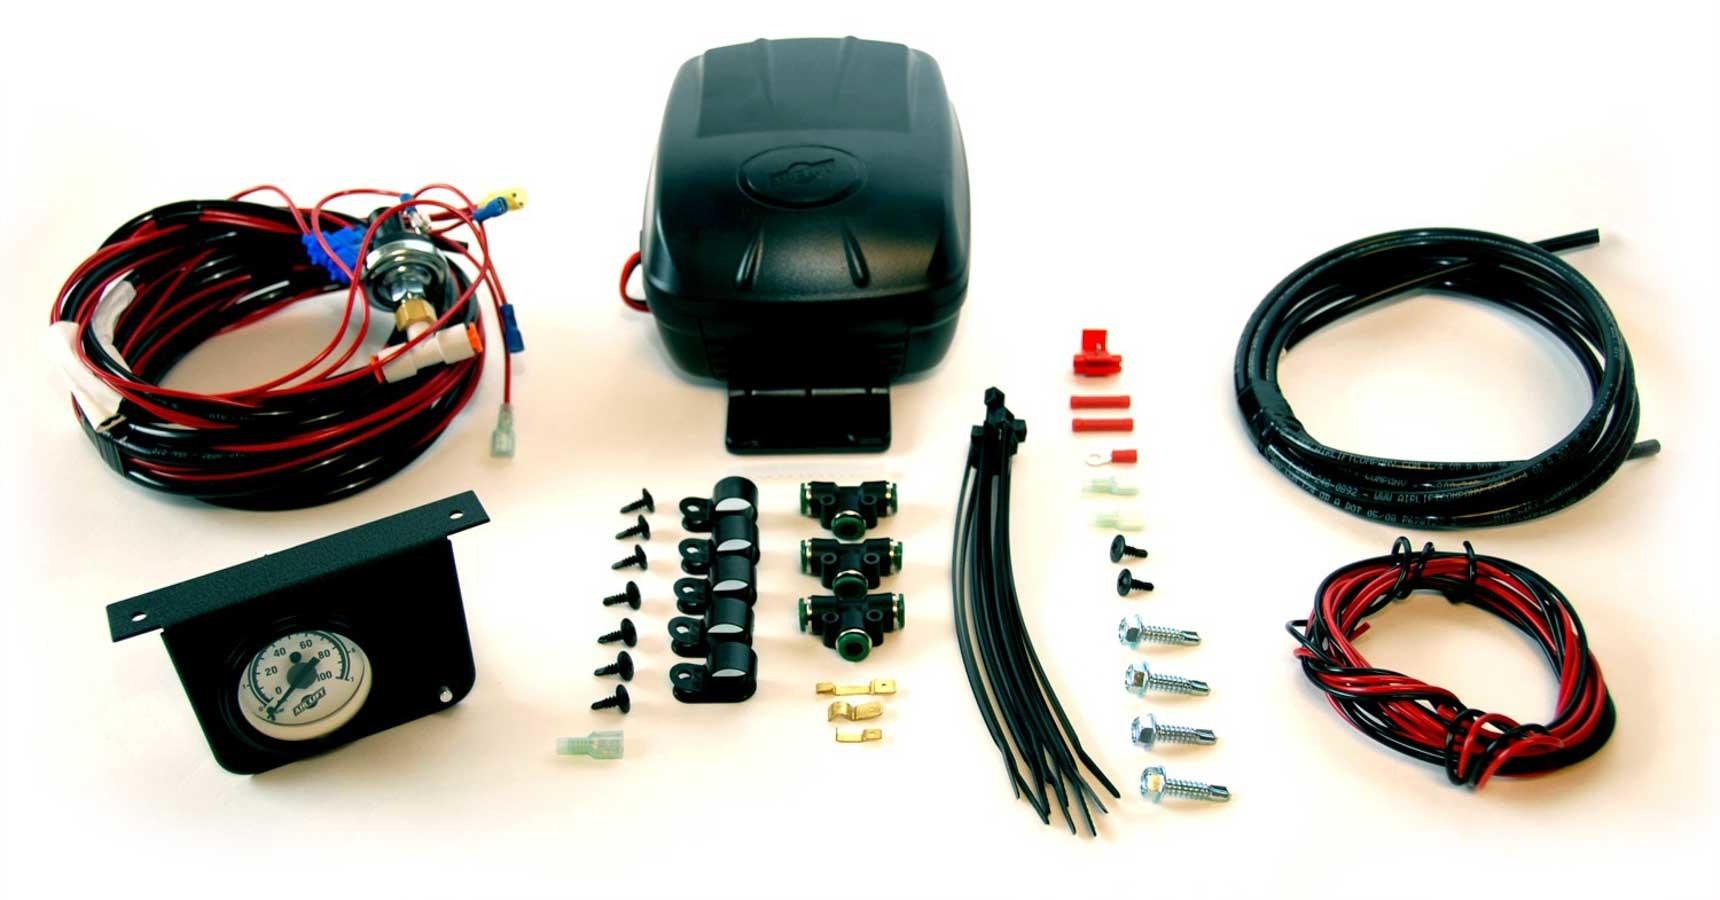 Air Lift 25592 Air Compressor, Load Controller II, Suspension, 100 psi Max, 12V, Single Gauge, Controls / Pressure Sensor, Airlift Air Spring Kits, Kit